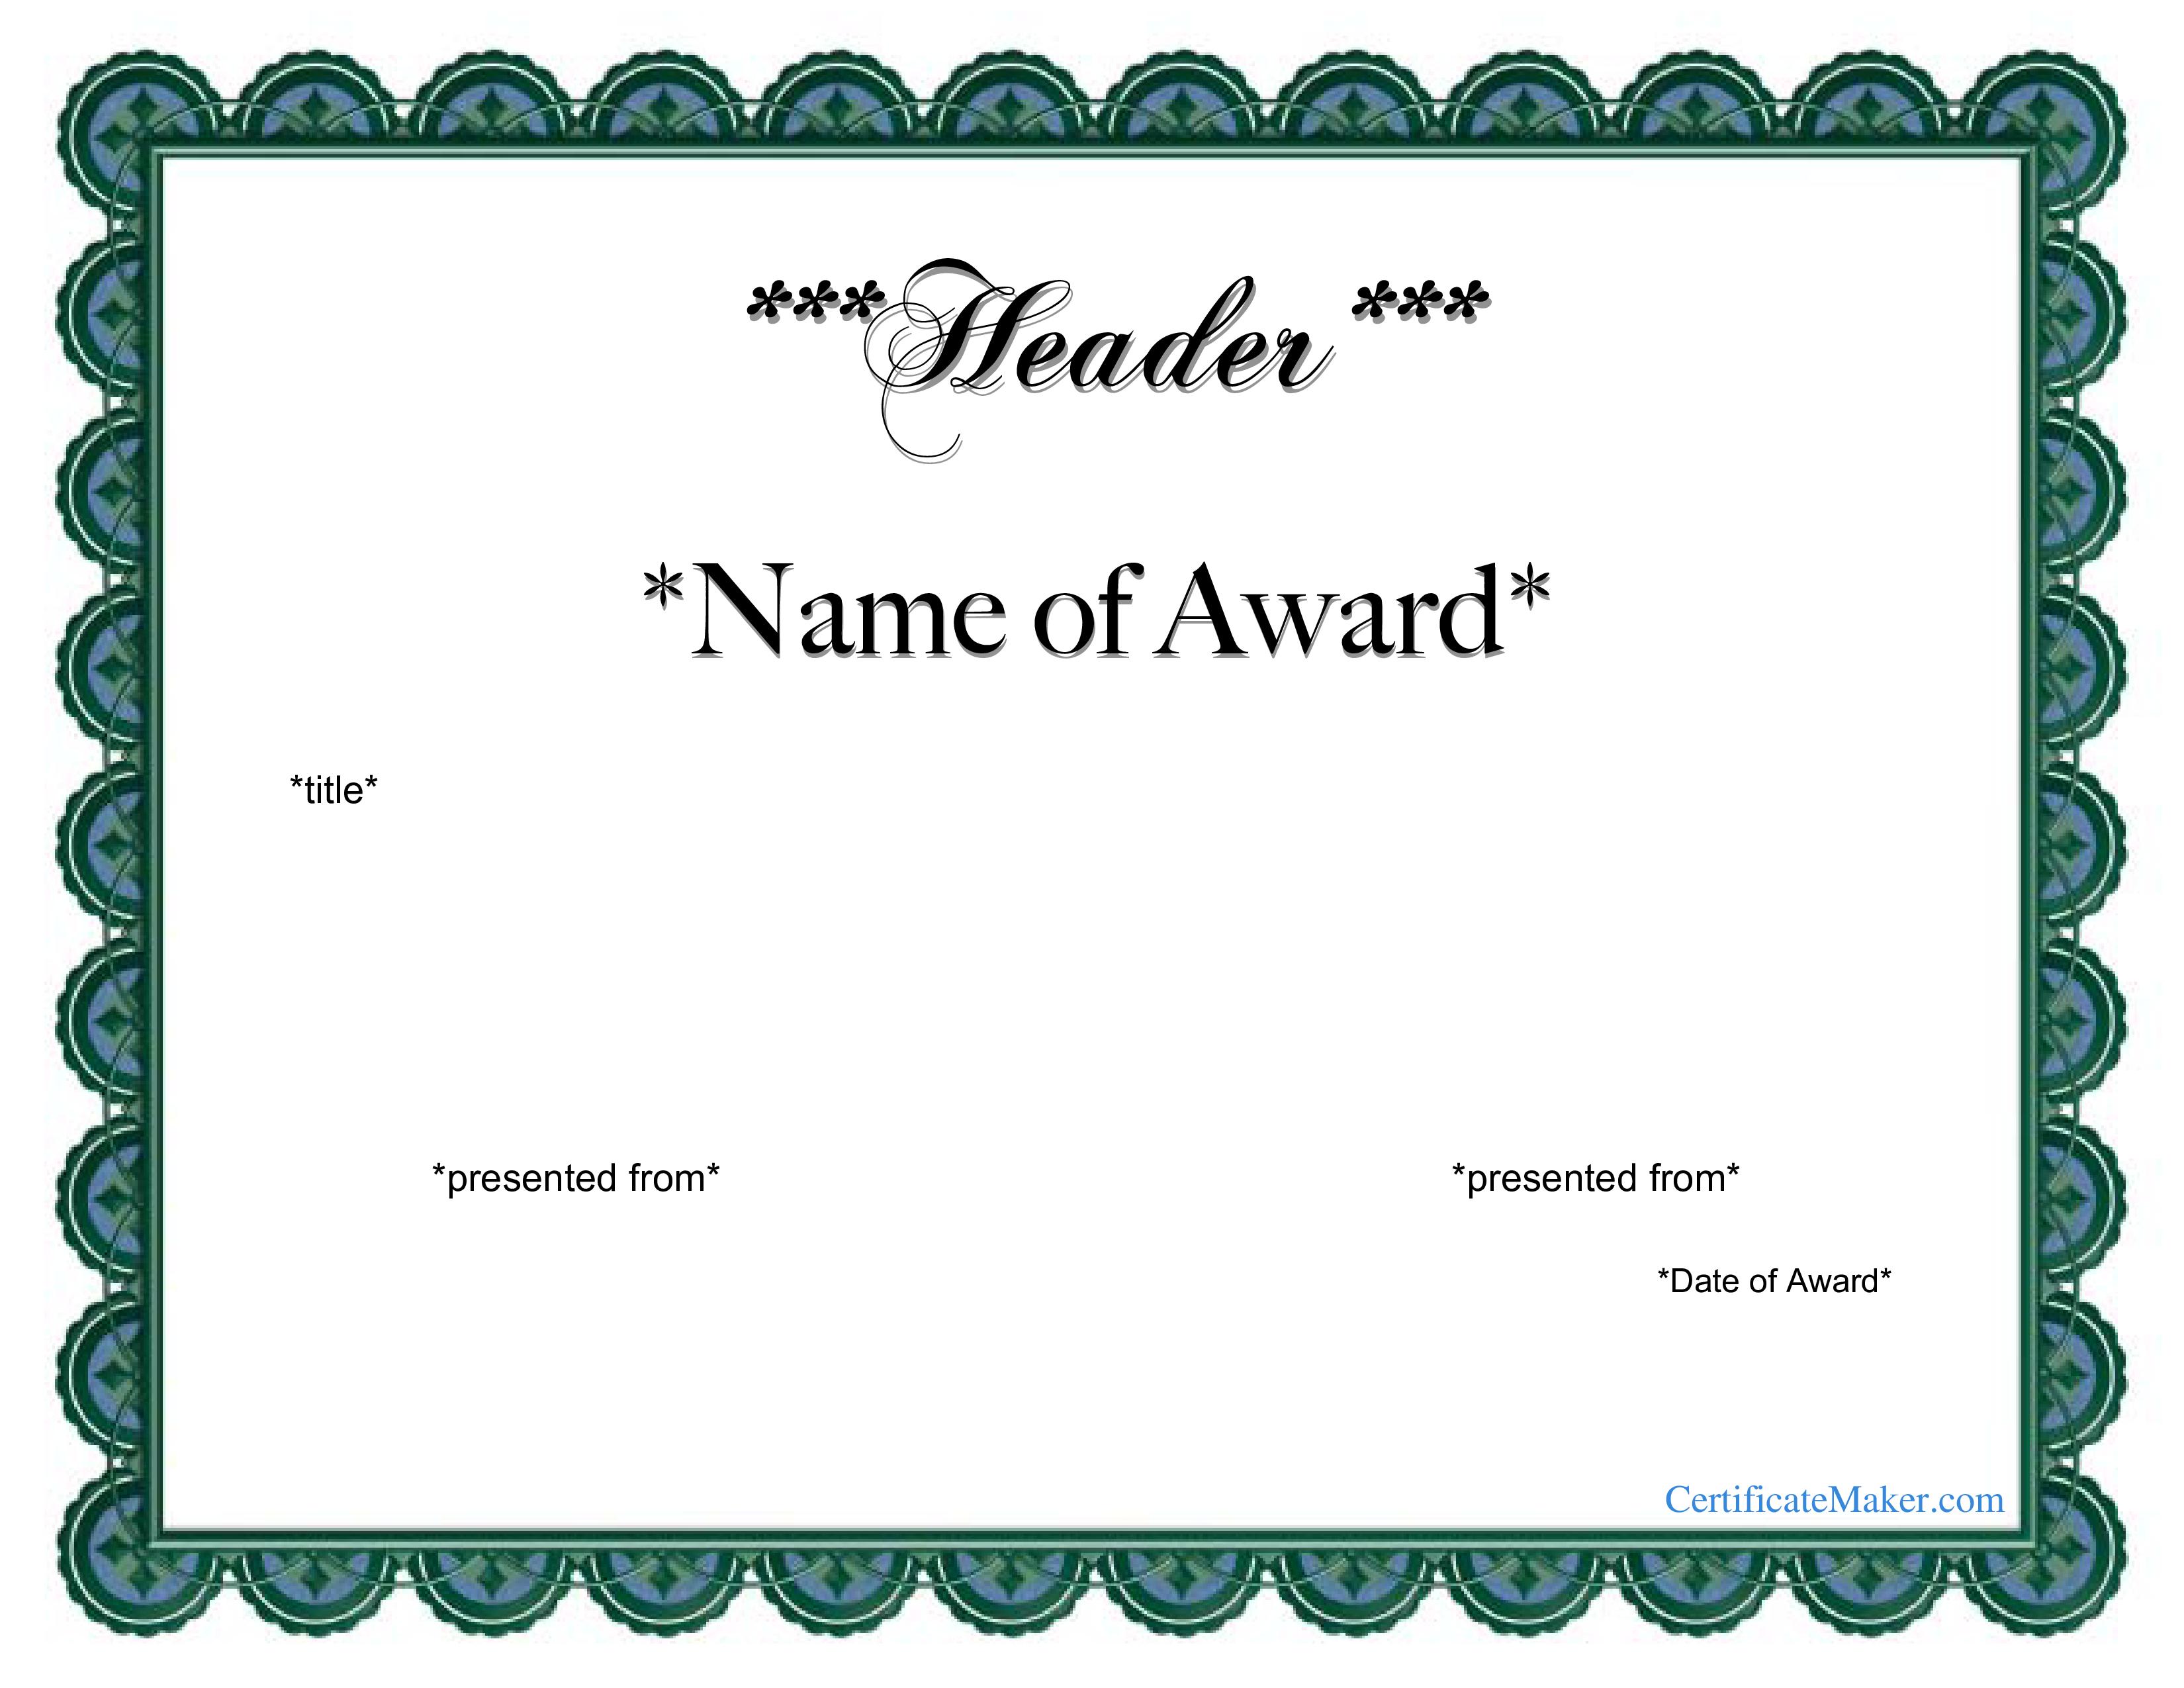 Free Printable Award Certificate | Templates At Allbusinesstemplates - Free Printable Awards